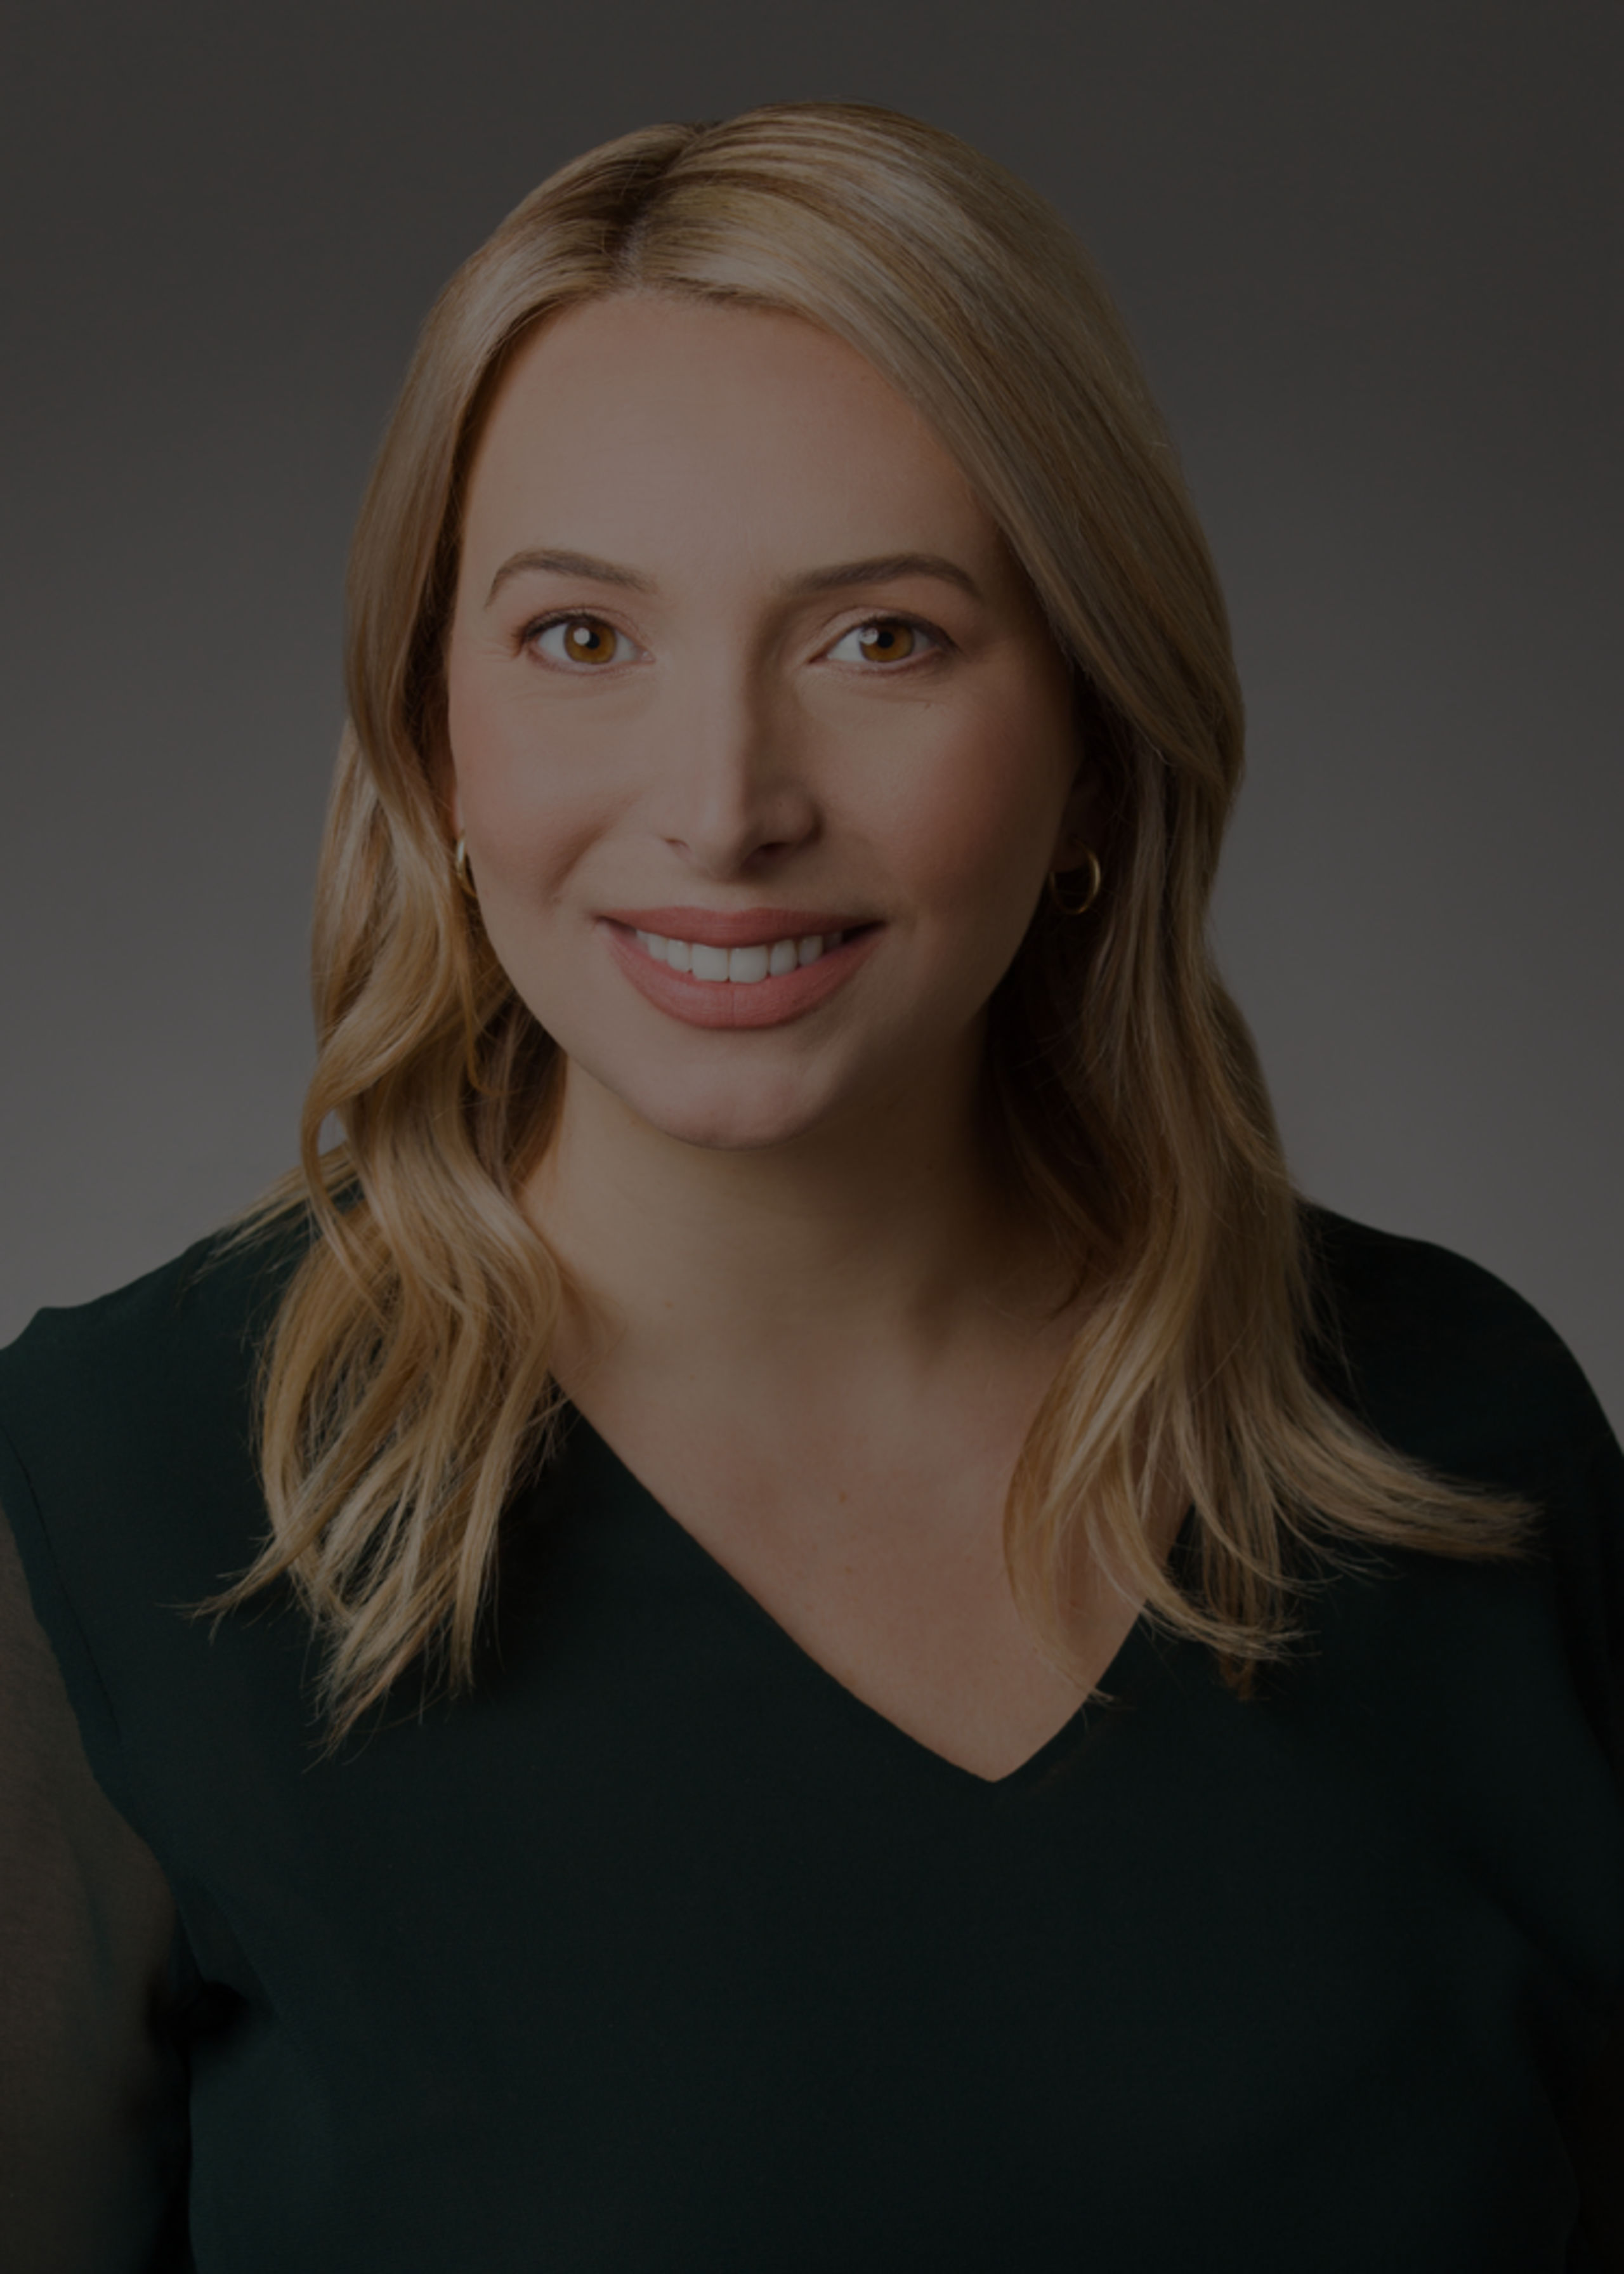 Karina Giraldo Mirkovich